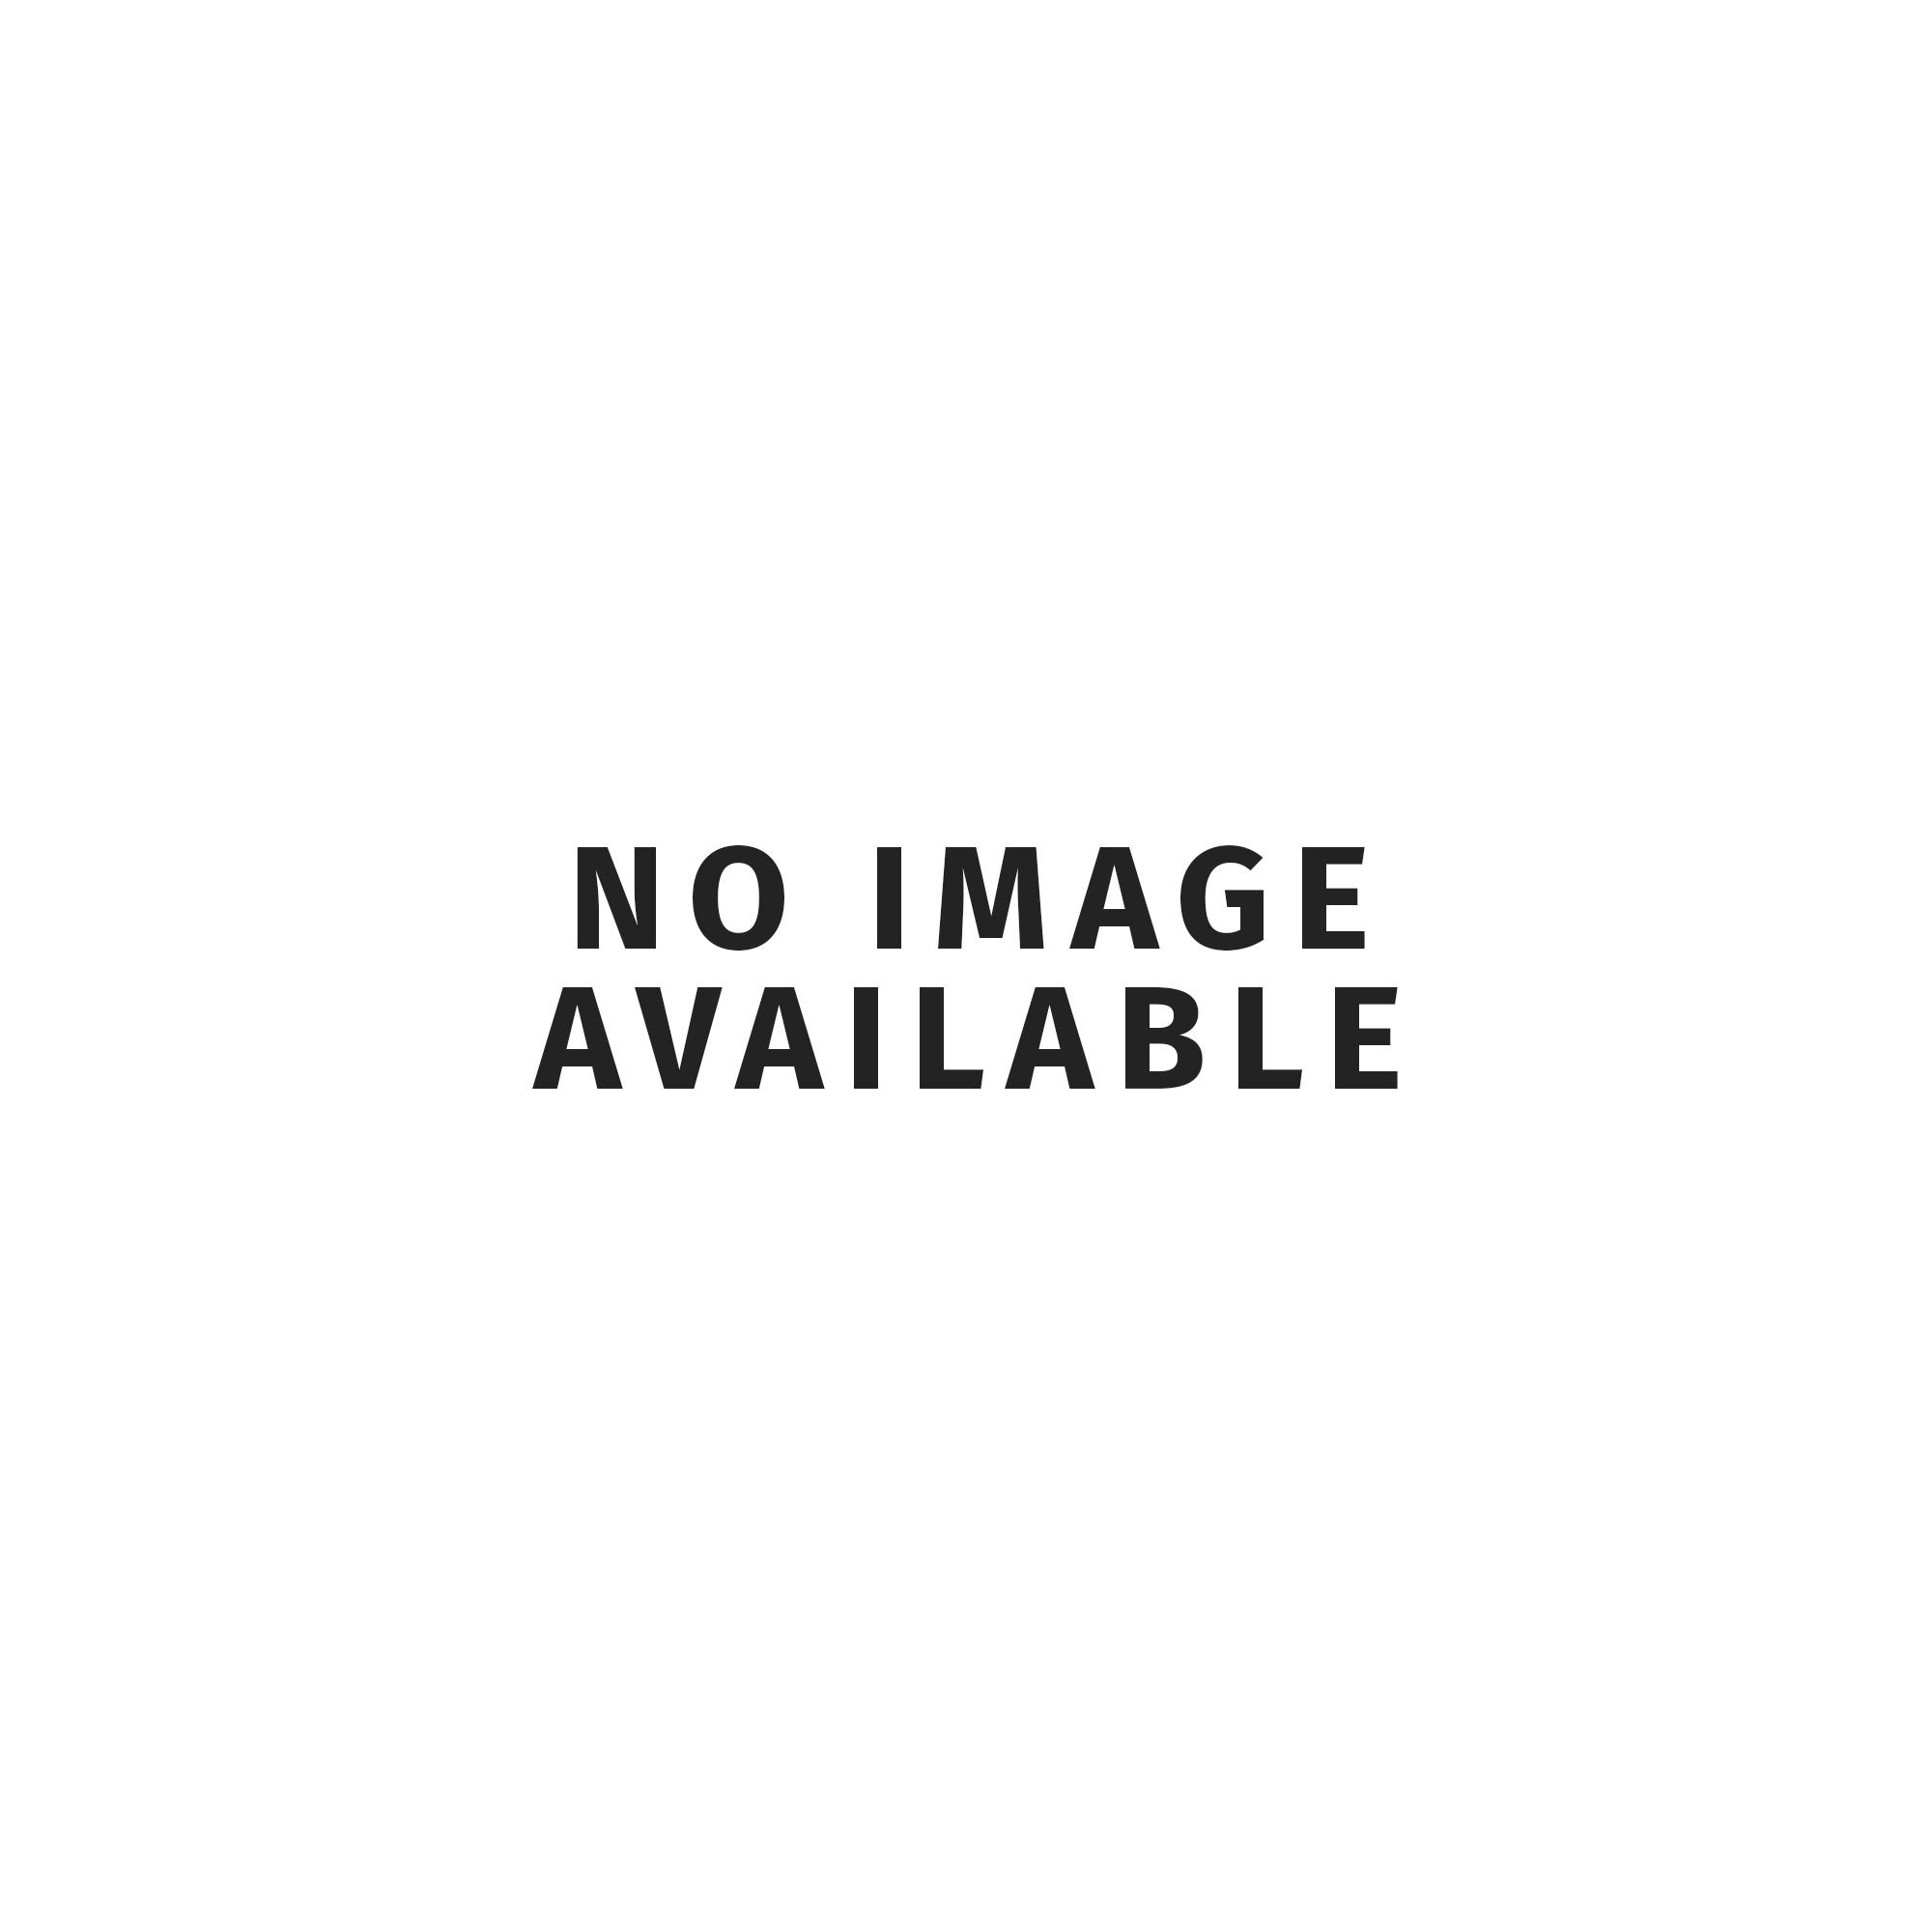 "Sturmey Archer HSL Series 1/2 x 1/8"" Sprocket 3-Dog"